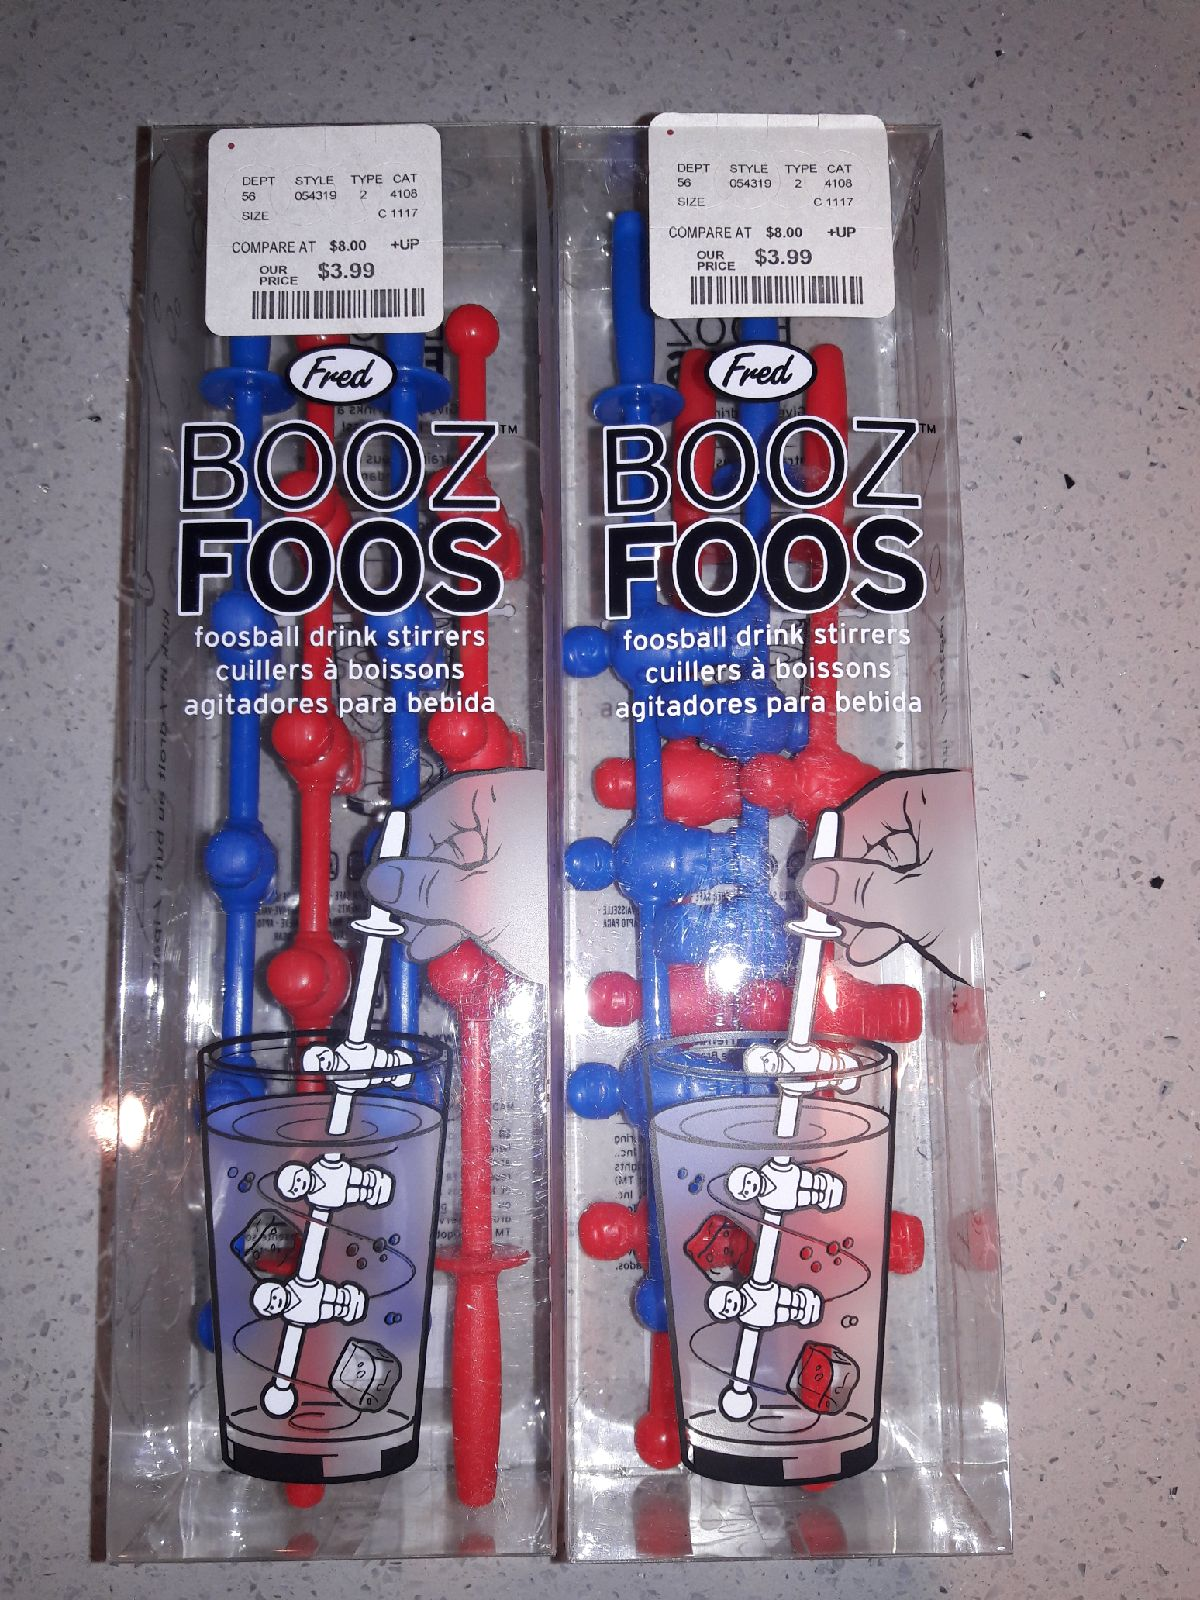 Booz Foos